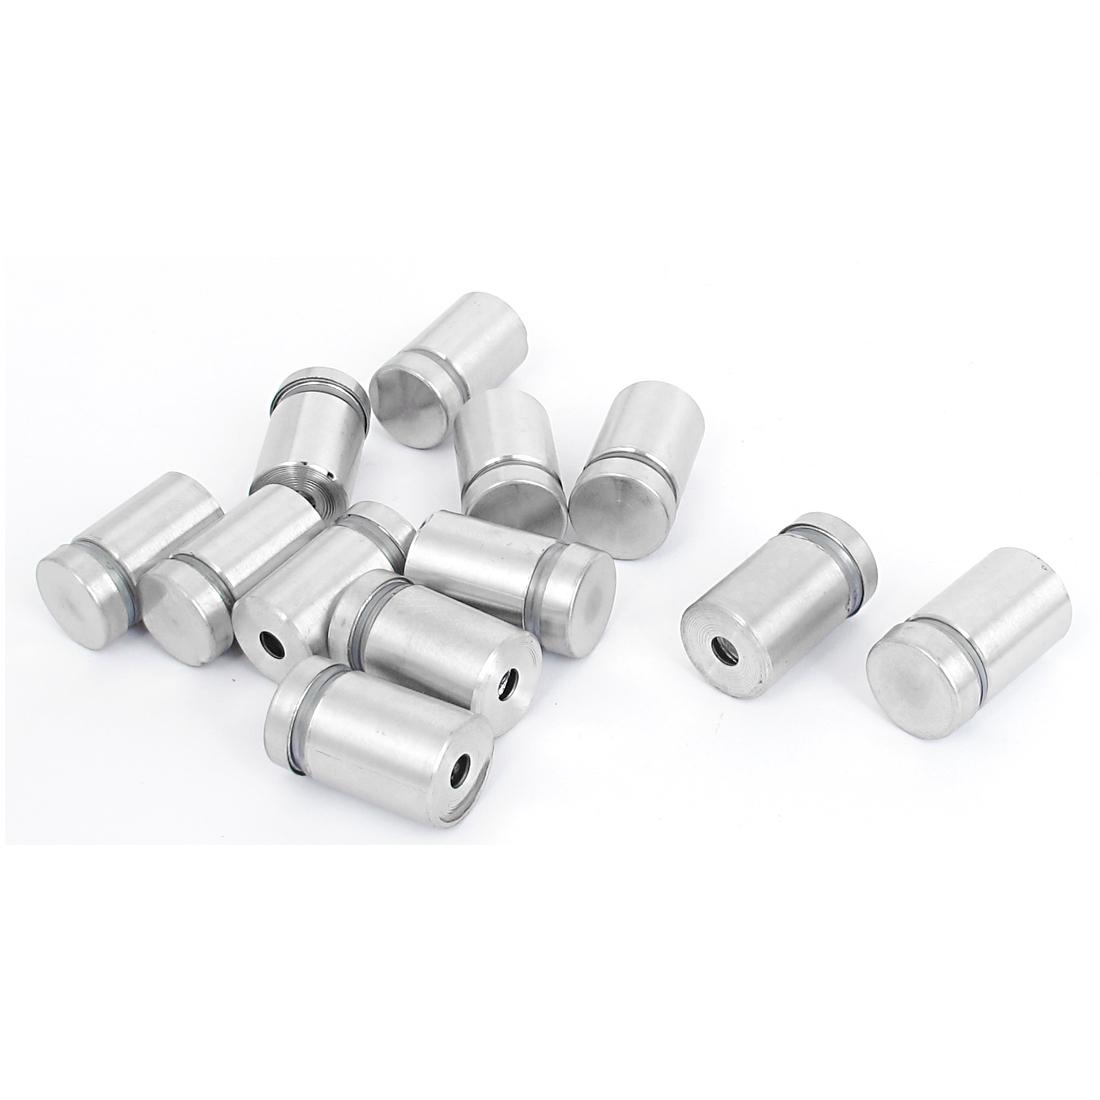 16mm x 25mm Stainless Steel Advertising Frameless Glass Standoff Pins 12pcs